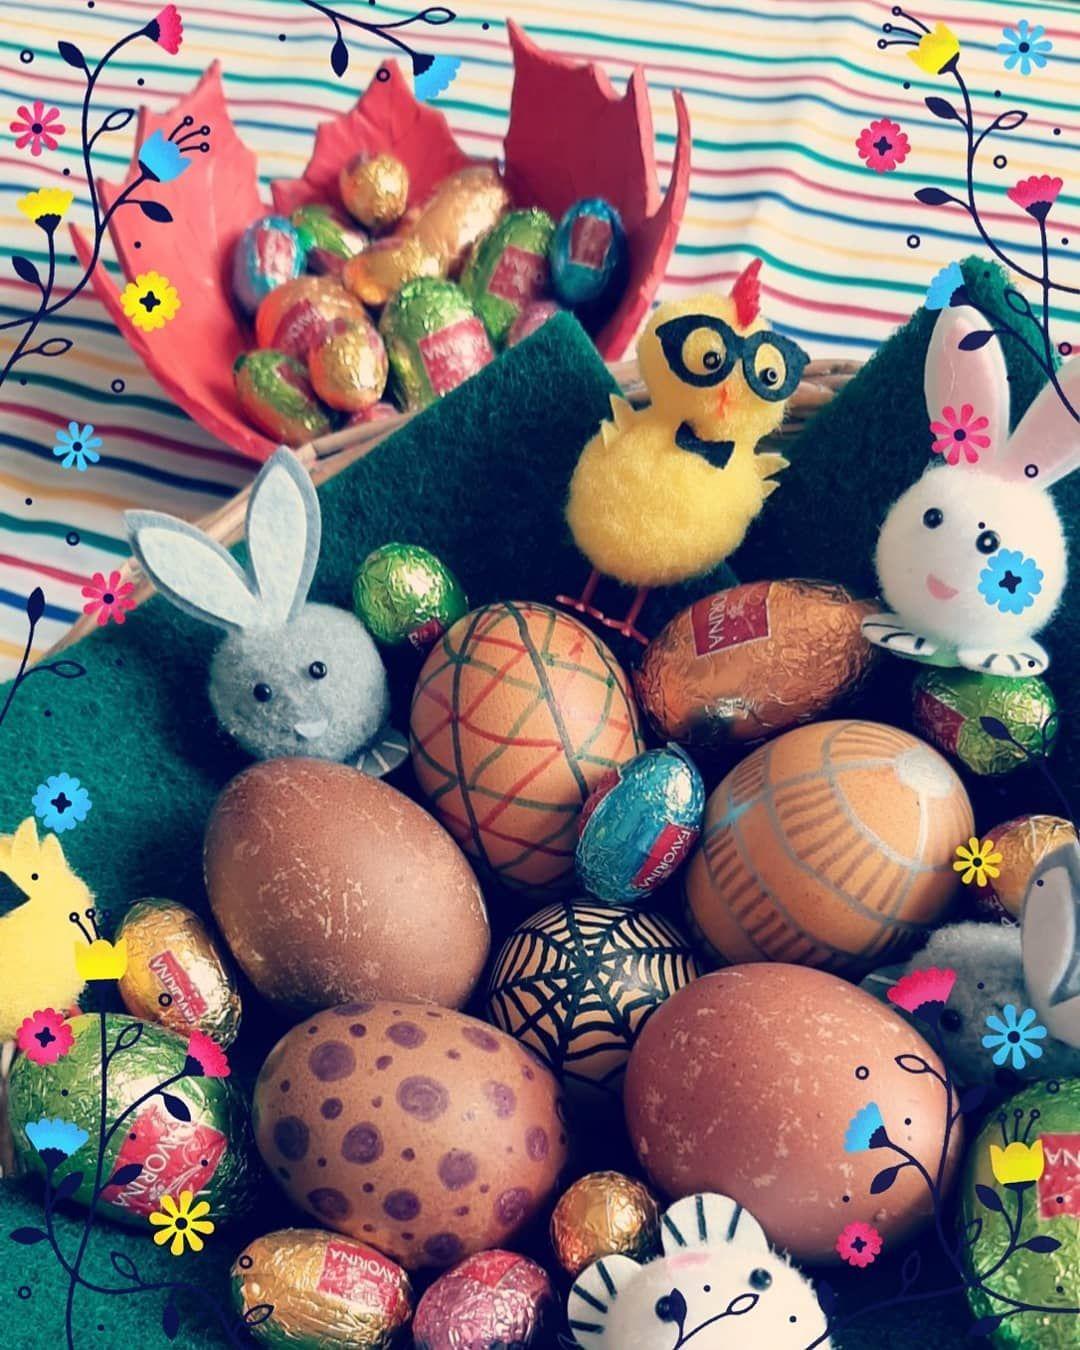 Diy Creative Easter Eggs Creative Easter Eggs Easter Eggs Diy Creative